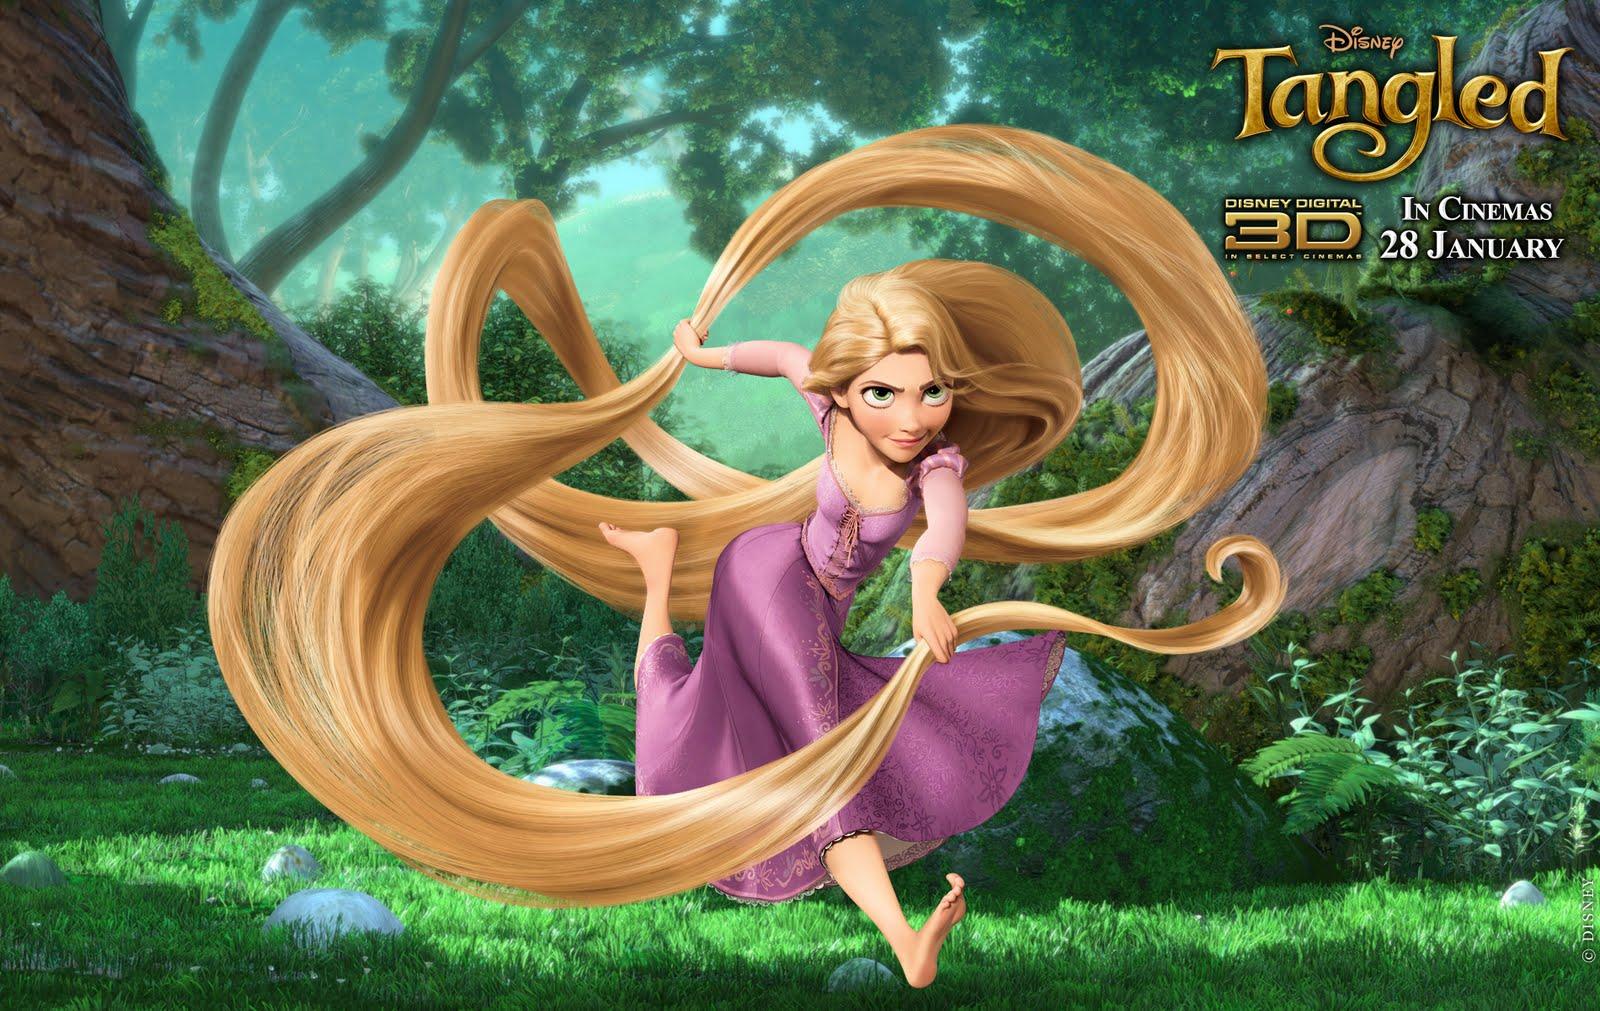 http://3.bp.blogspot.com/-Z7Joh-HroB4/TfrsecGNe7I/AAAAAAAAAls/mjgUSzjY-yo/s1600/rapunzel-Disney-Tangled-Wallpaper.jpg